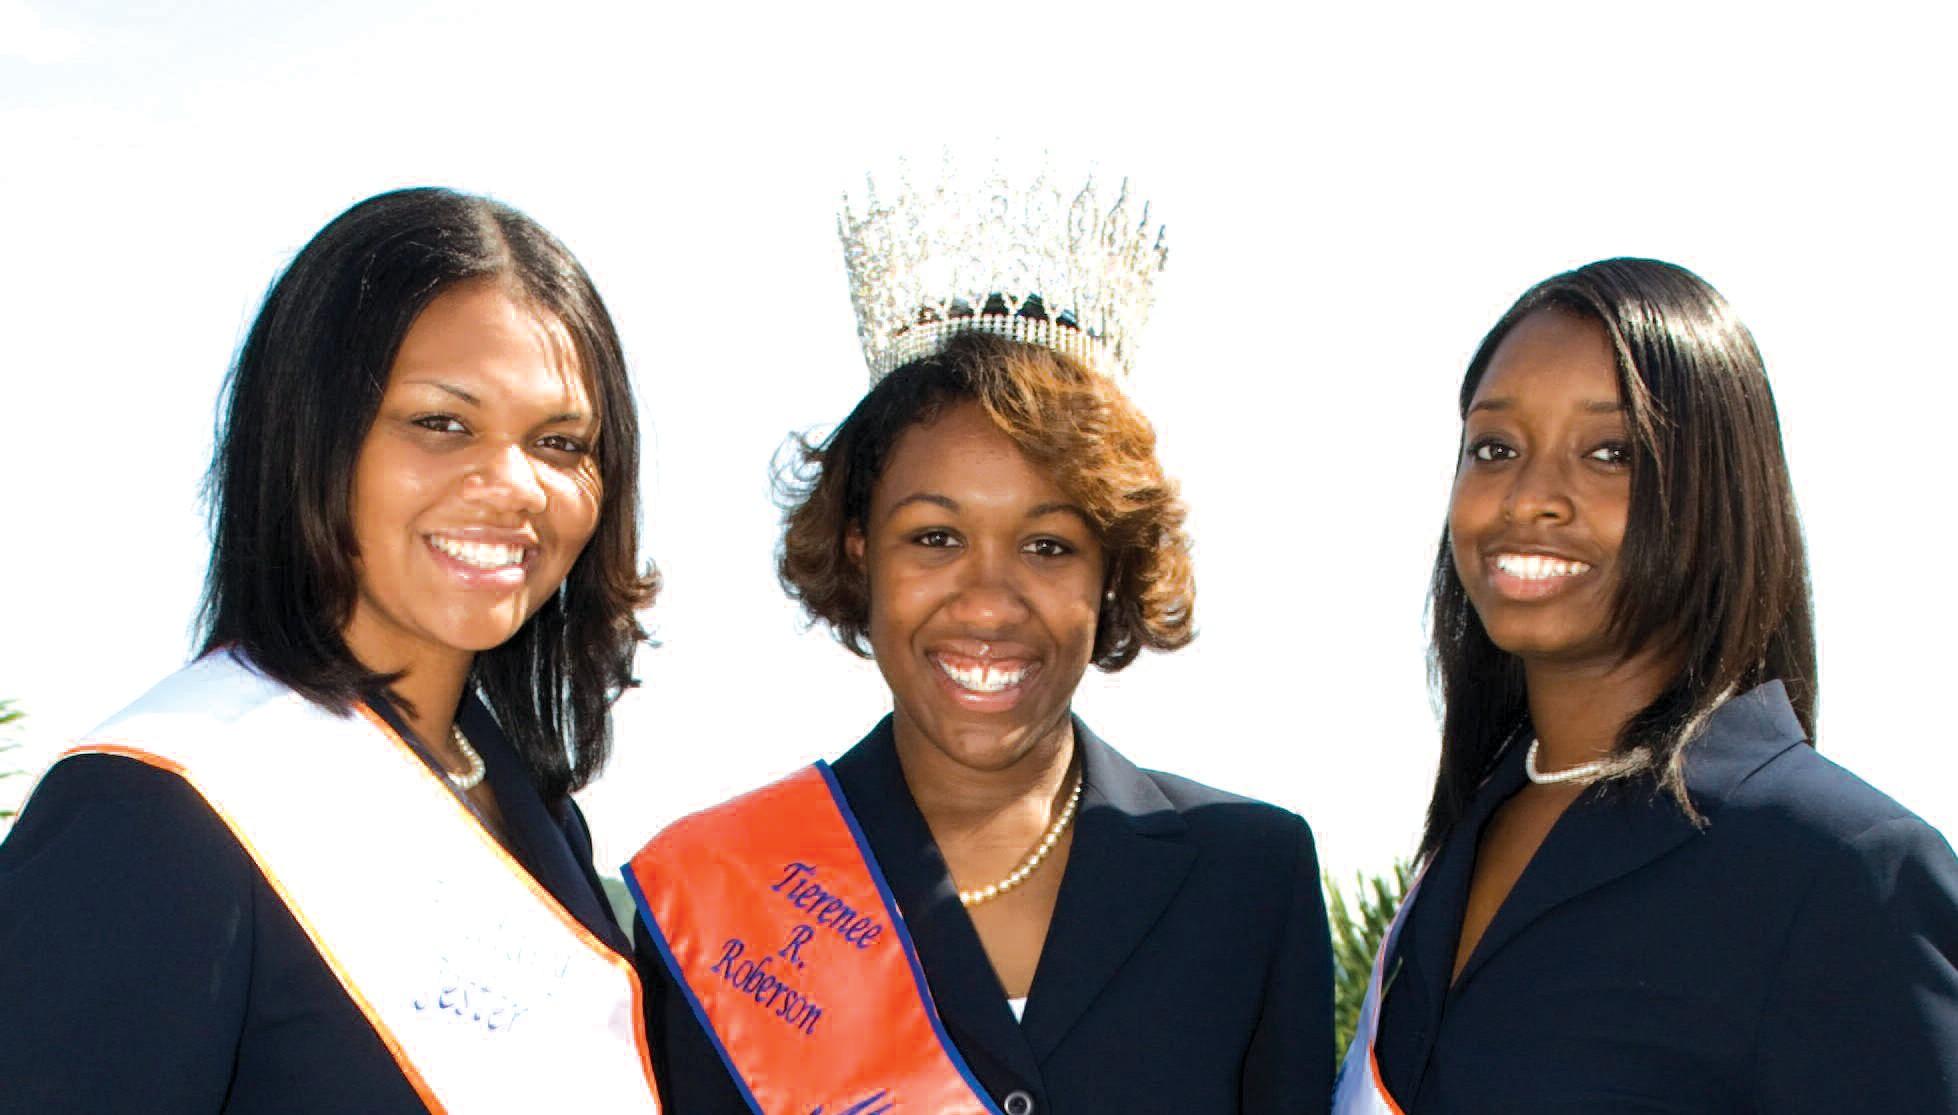 L-R: Brittany Jester, First Attendant to Miss SSU, Tierenee Roberson Miss SSU 2009-2010, and Jasmine Raglin, Second Attendant to Miss SSU